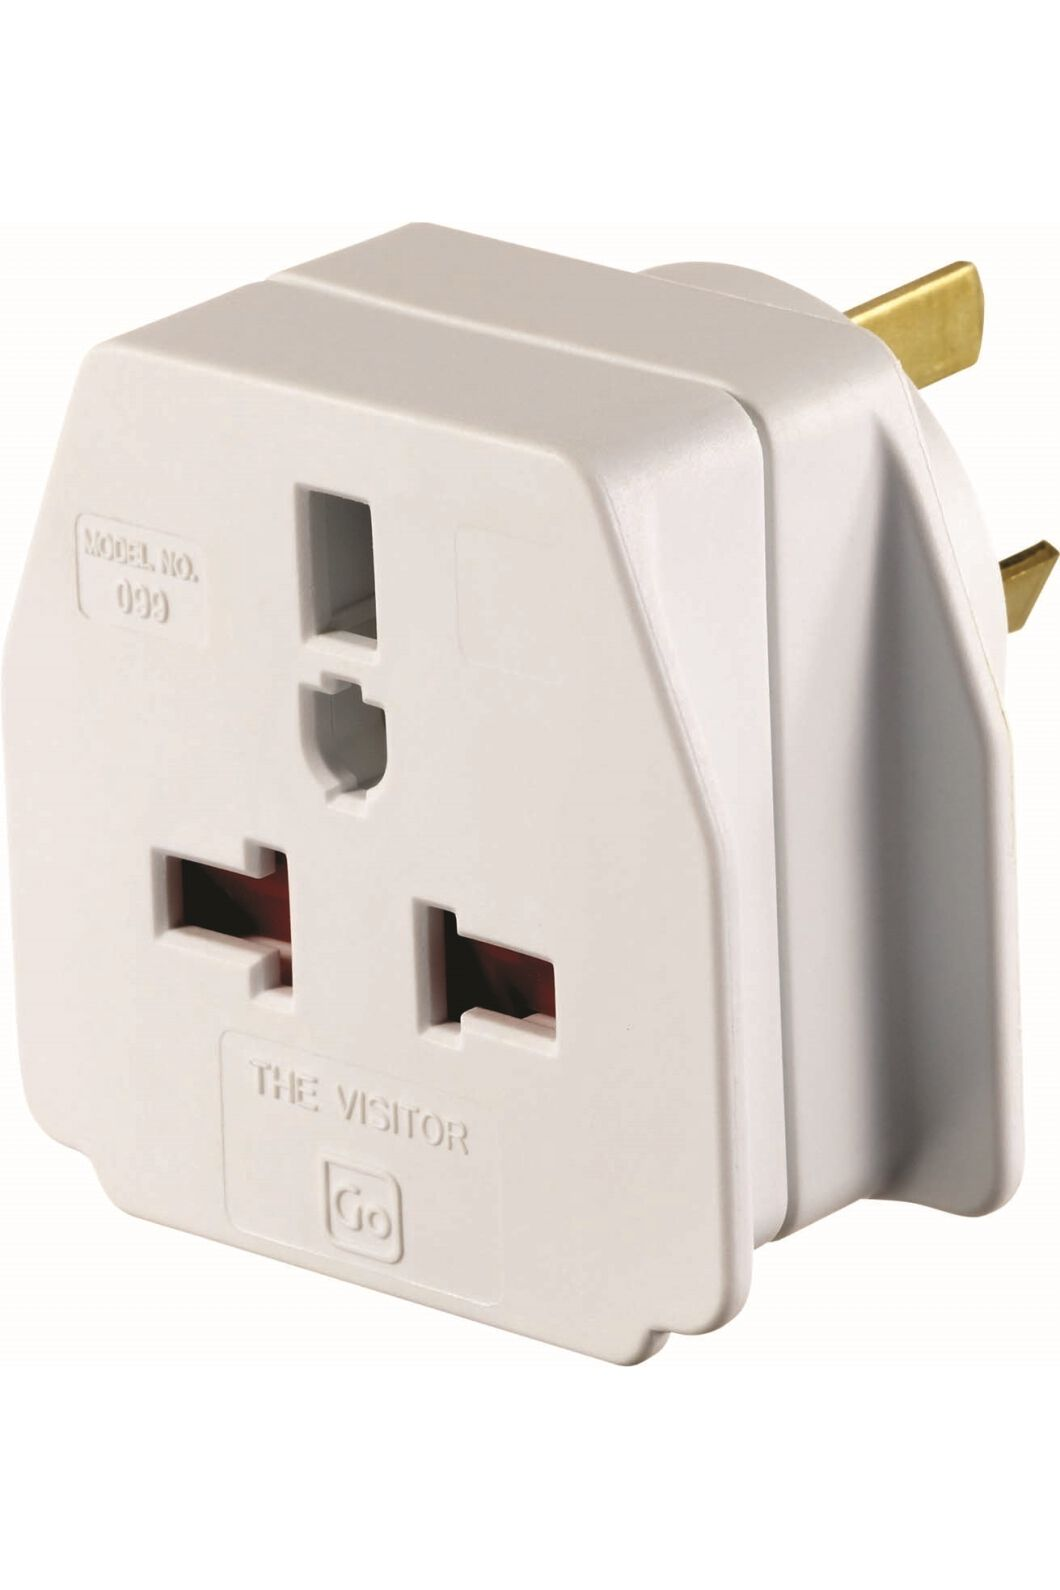 Go Travel Visitor Adaptor Plug, None, hi-res